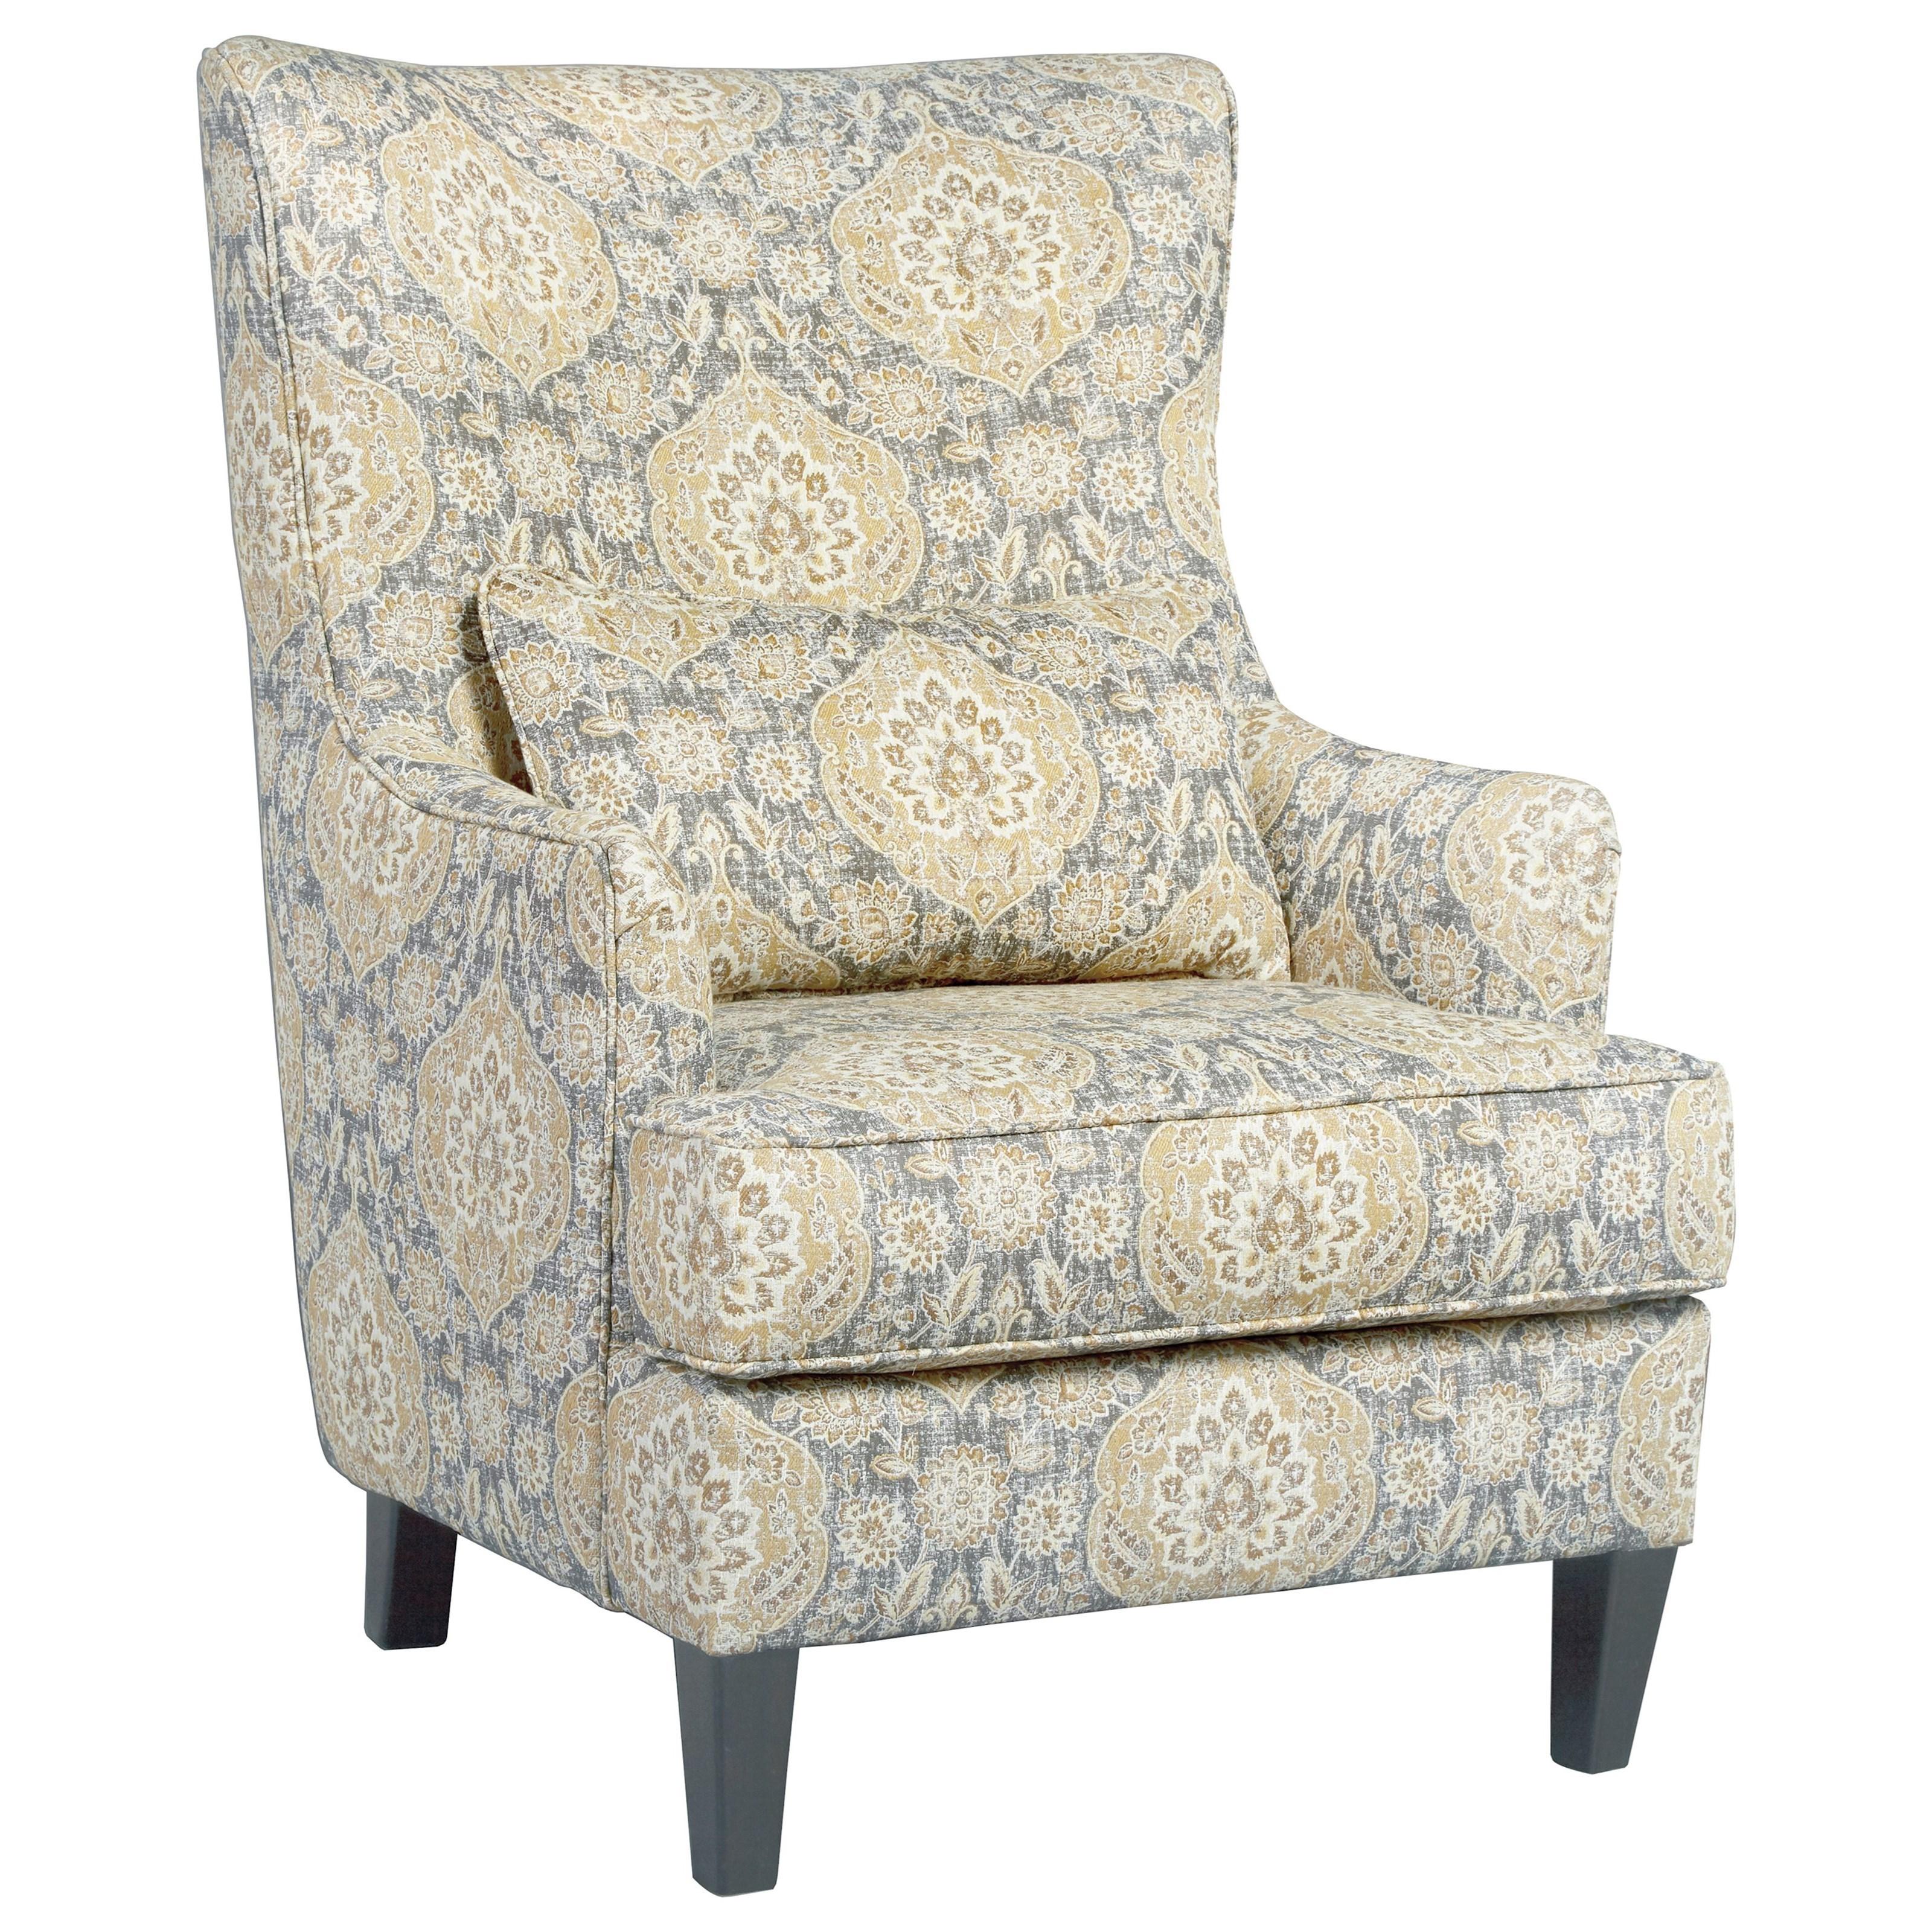 Ashley Furniture Aramore 1280522 Scalloped Wingback Accent